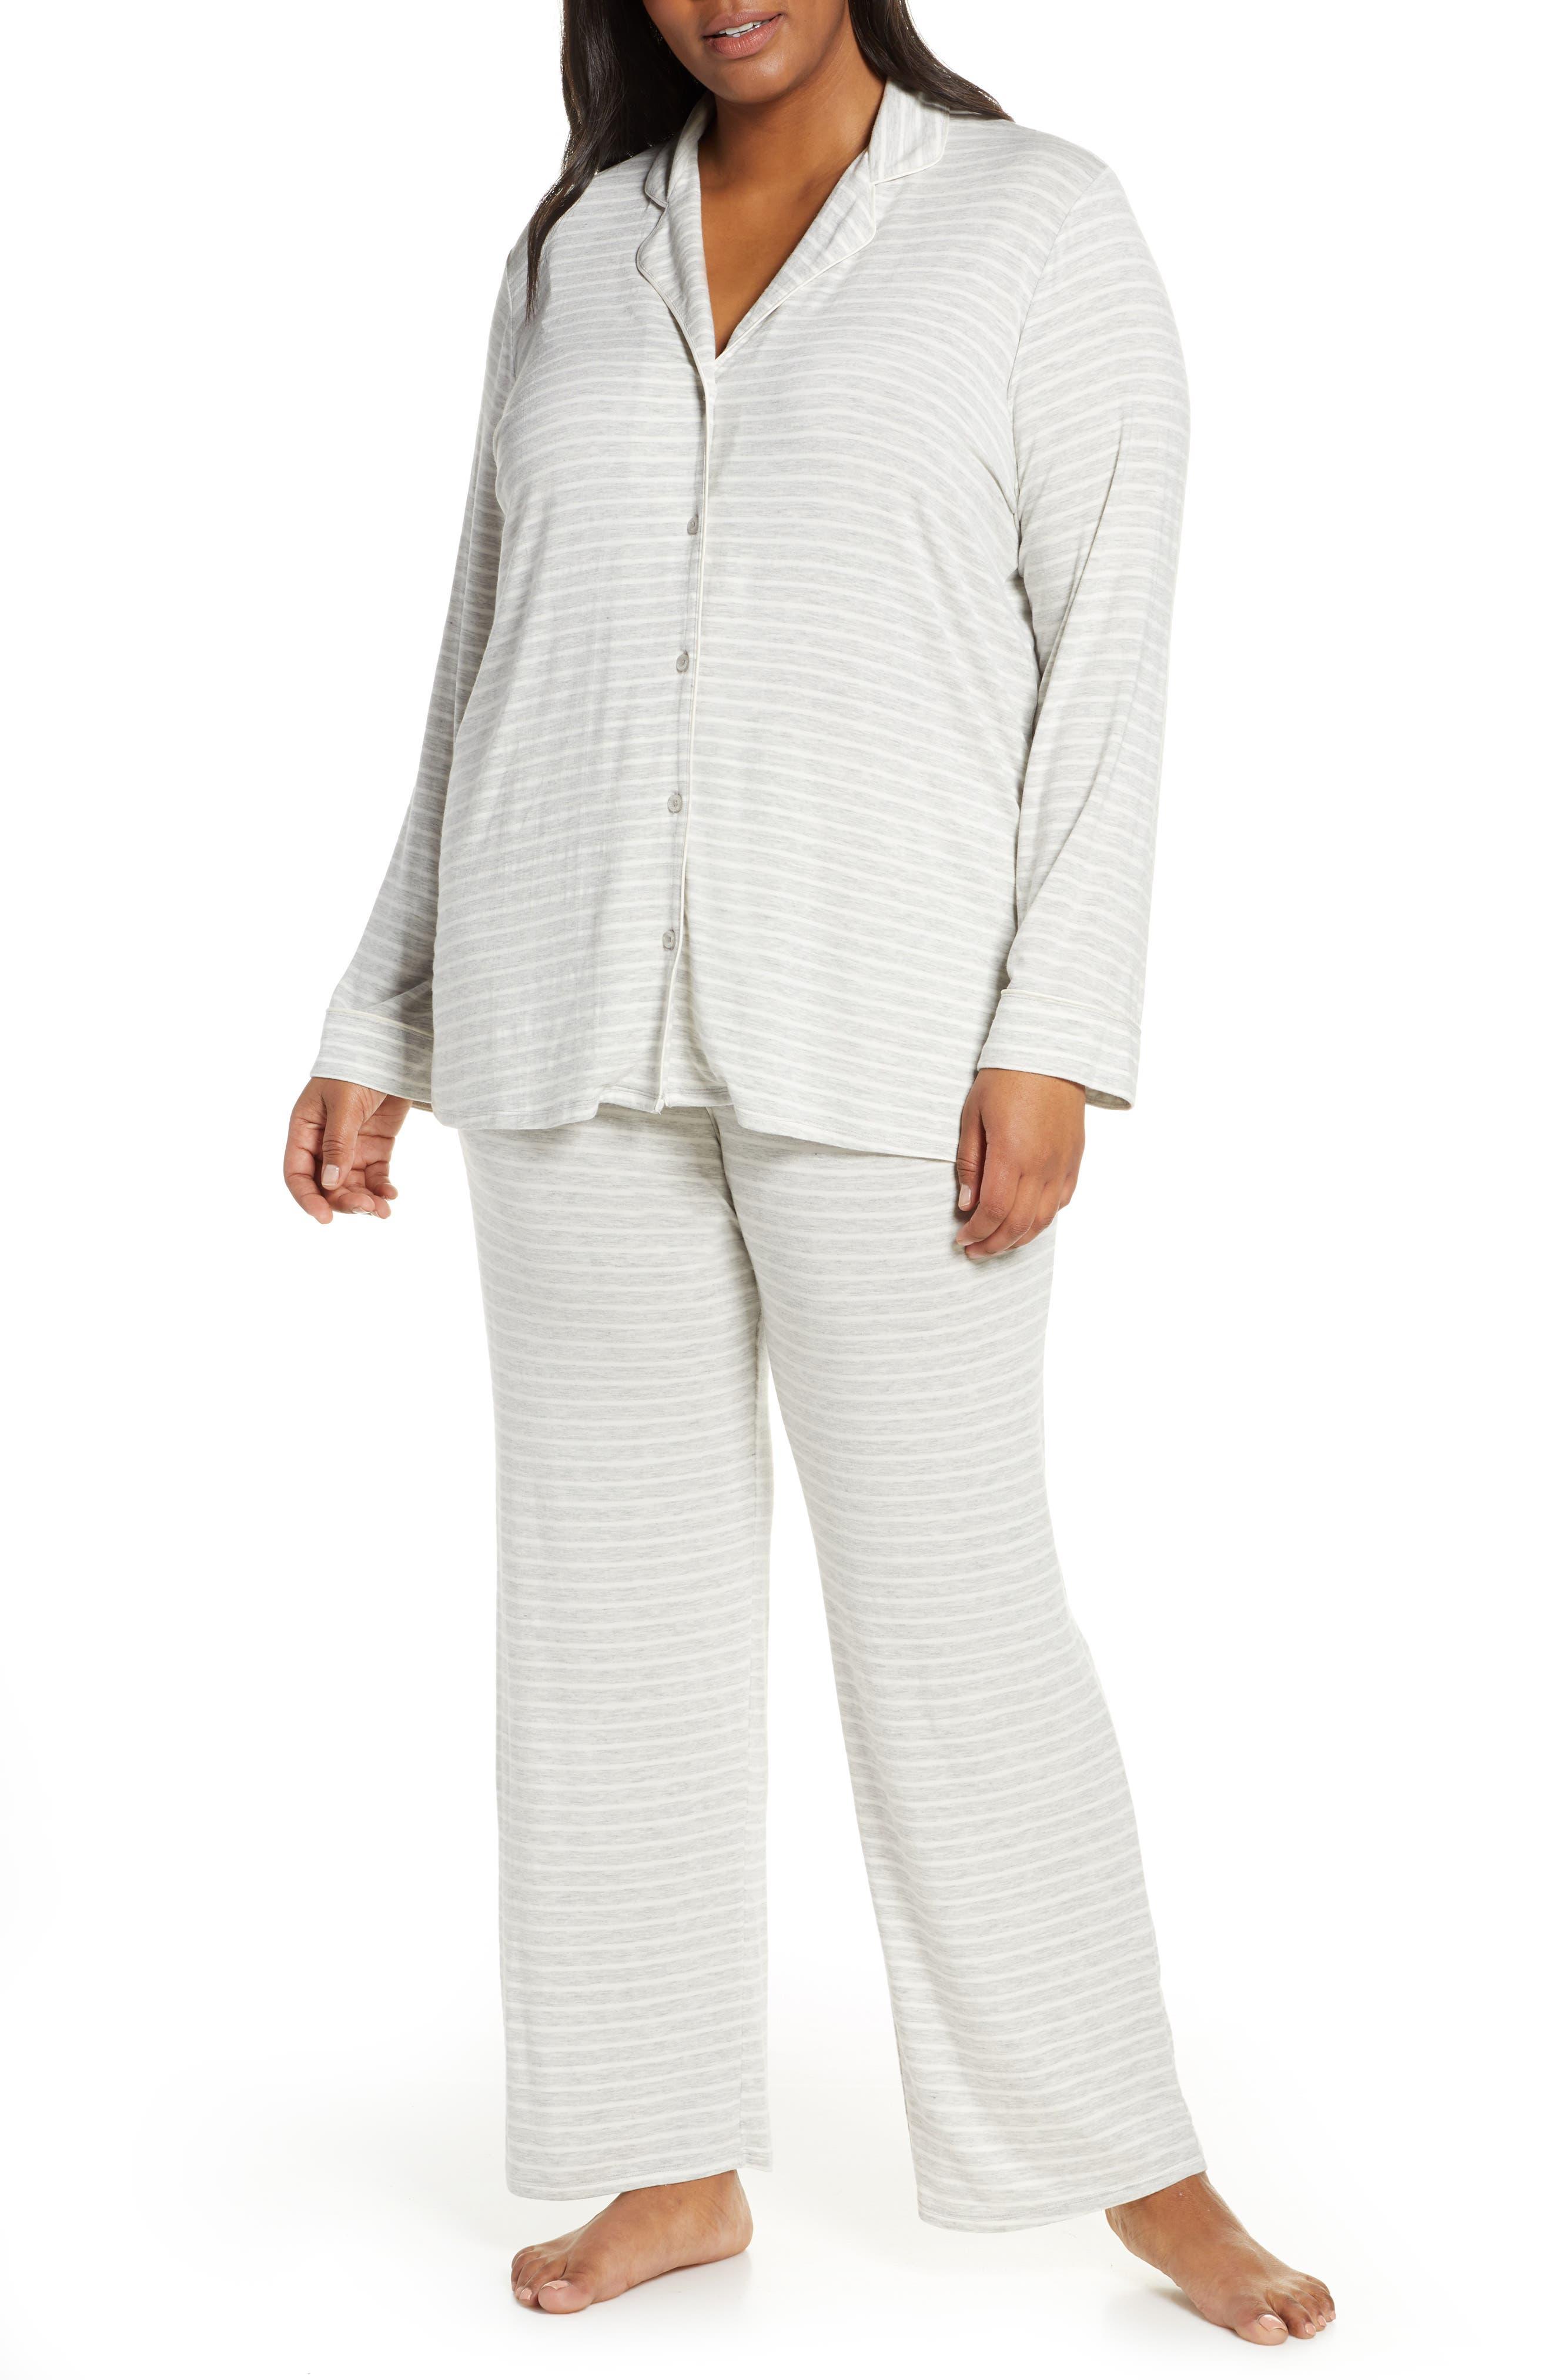 Nordstrom Lingerie Moonlight Pajamas (Plus Size)